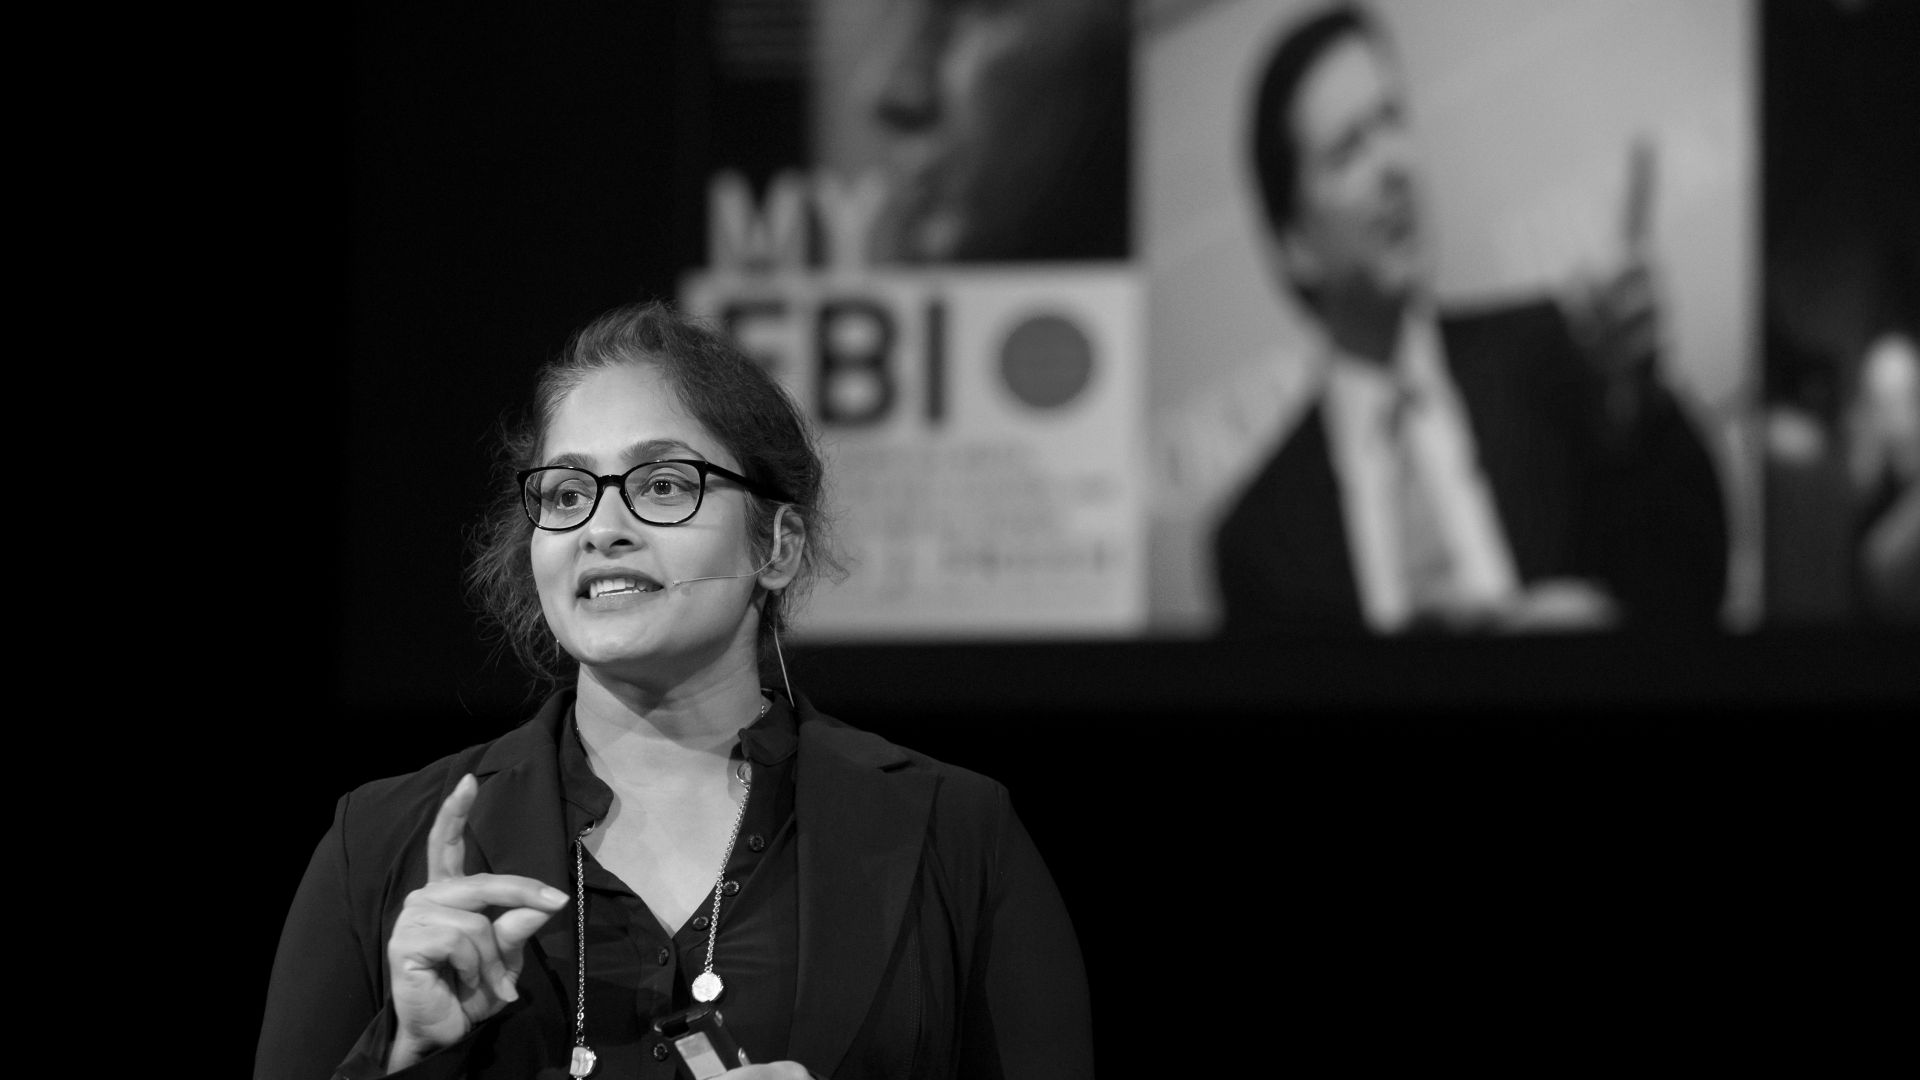 Presentation of Jaya Baloo (CISO KPN) at High Tech Campus Eindhoven